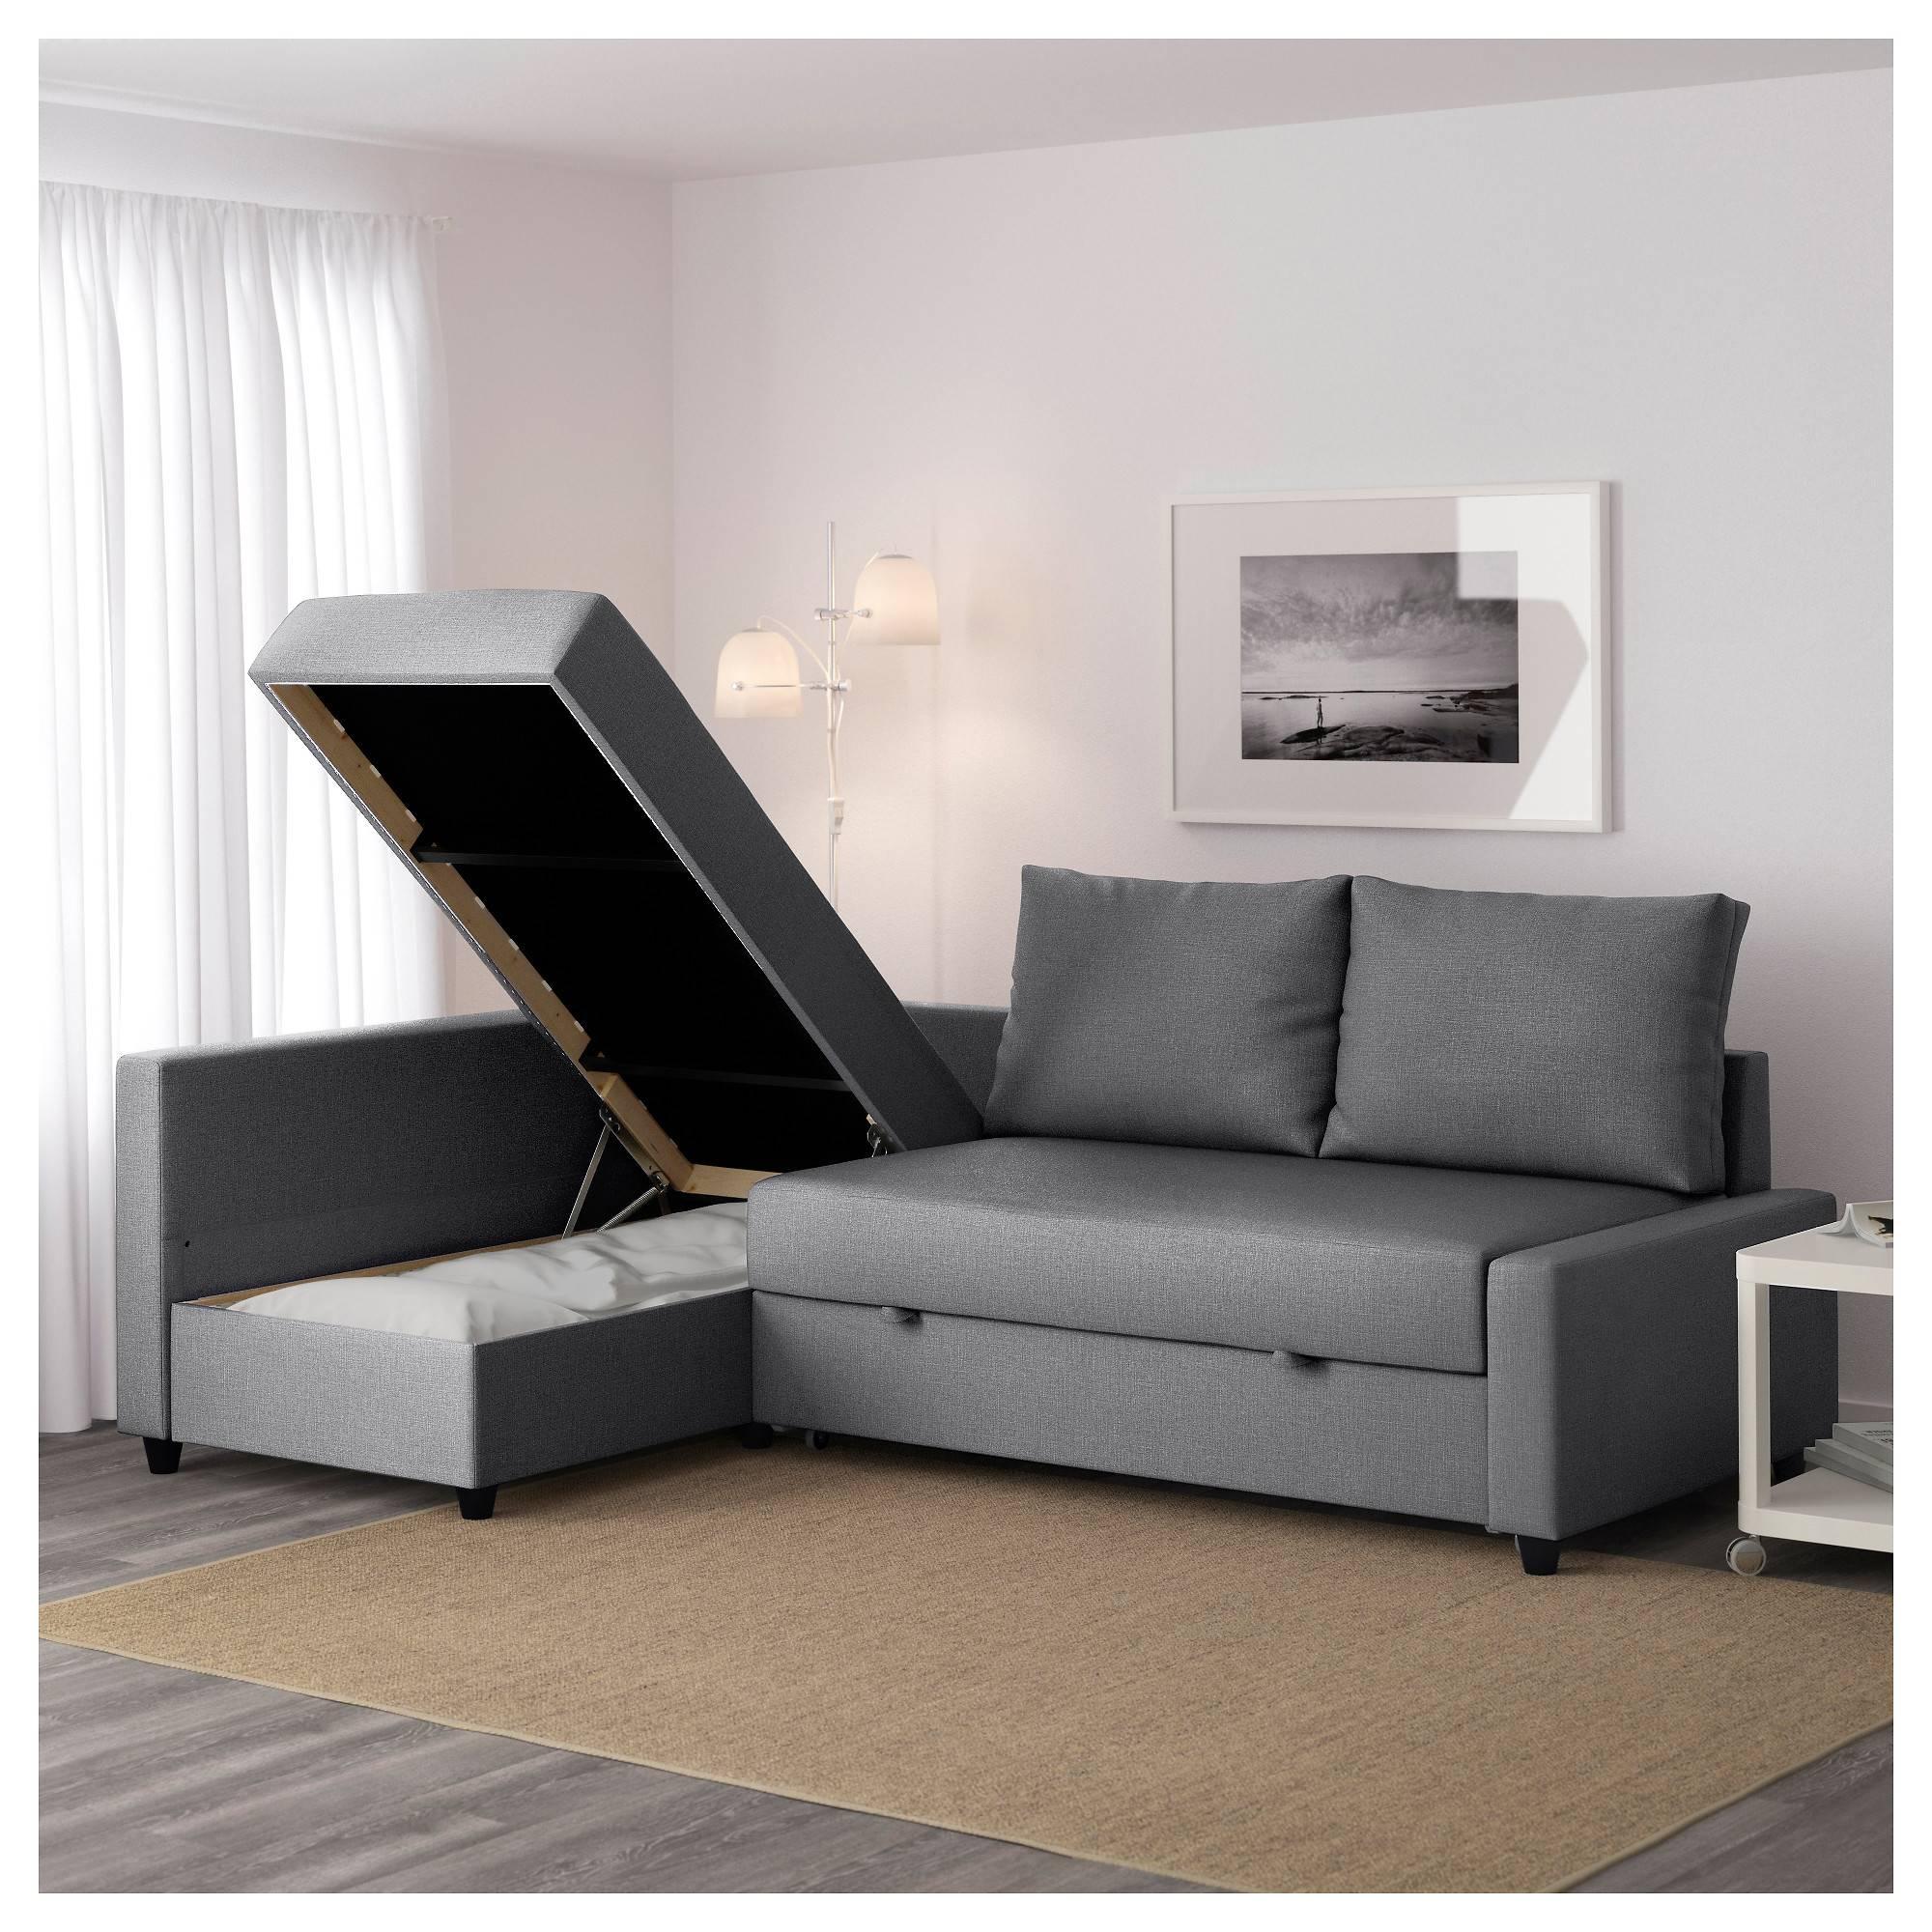 Friheten Corner Sofa-Bed With Storage Skiftebo Dark Grey - Ikea regarding Storage Sofas Ikea (Image 10 of 25)